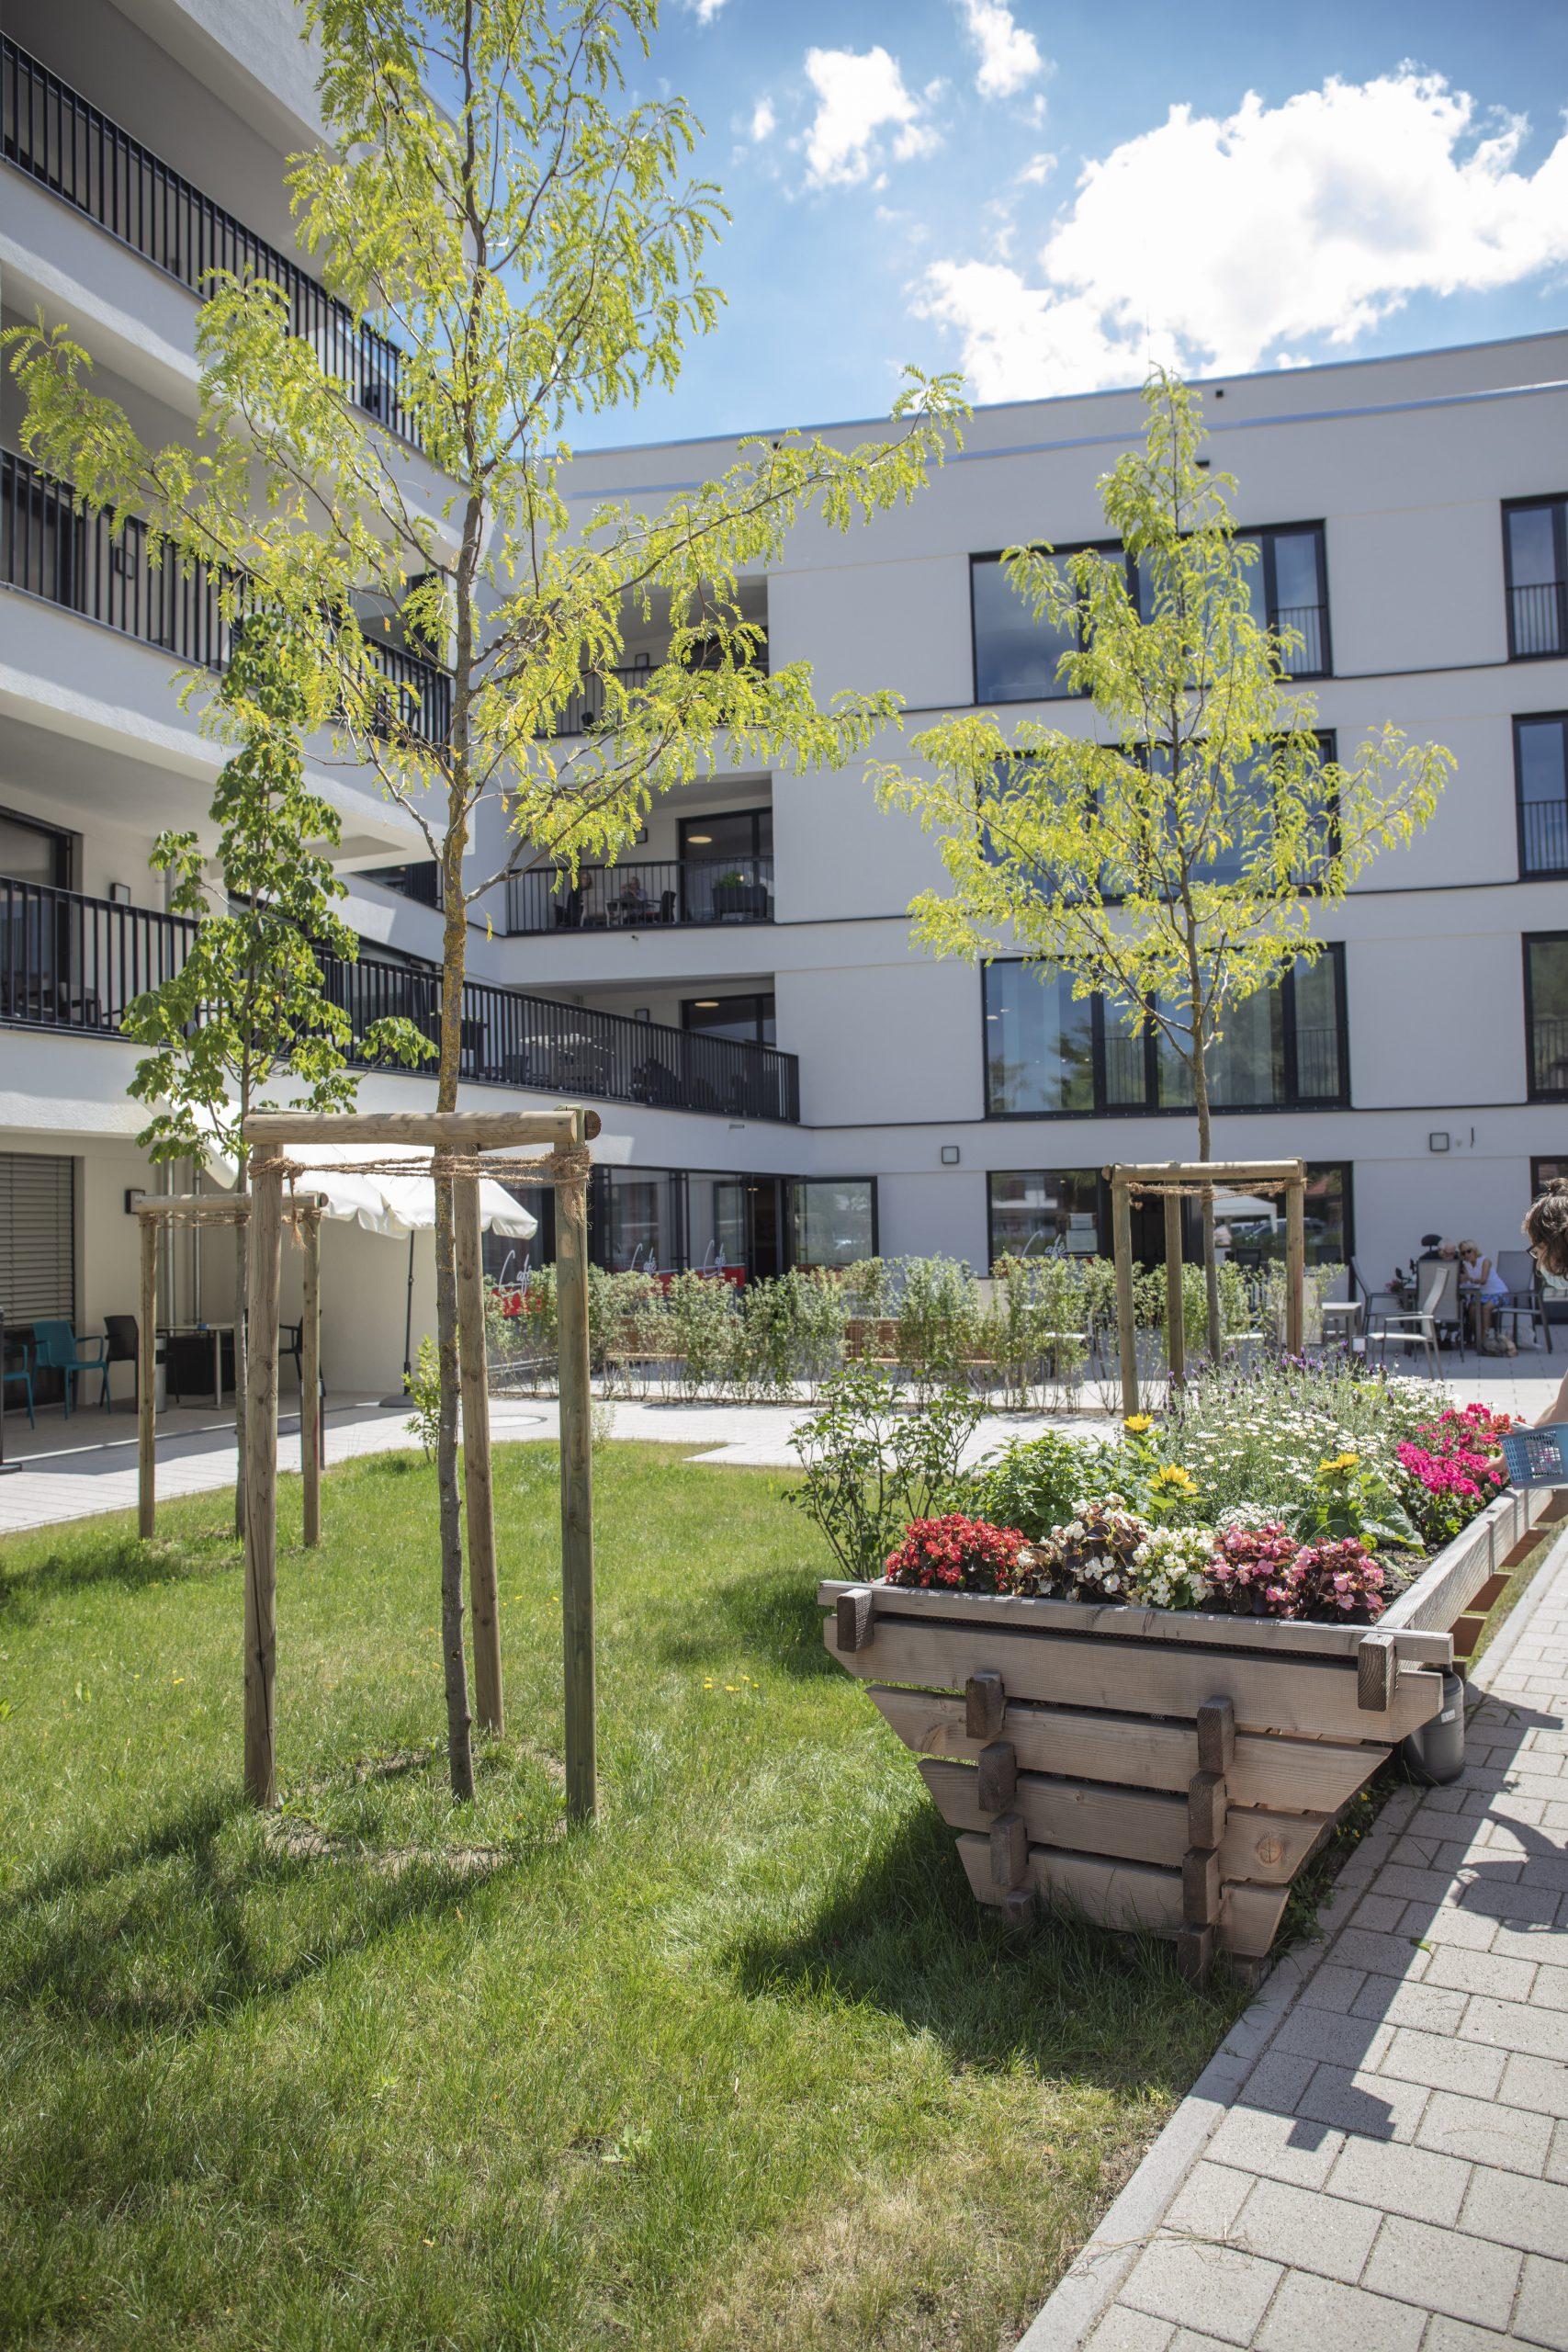 Garten Anna Leimbach Haus 1 scaled AWO Karlsruhe